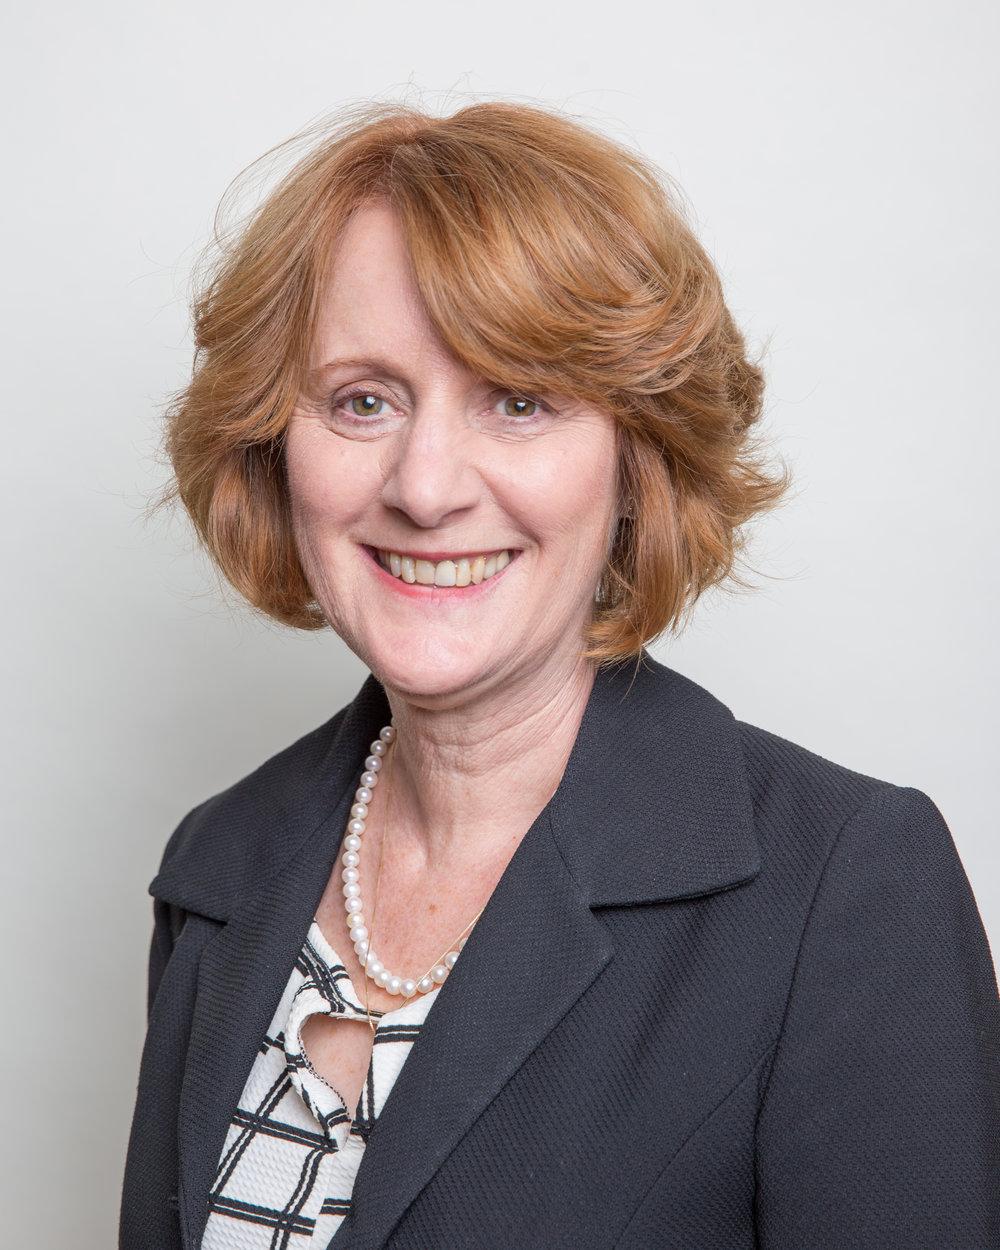 SOUTHEAST  Dr. Linda Cash (Bradley County Schools)